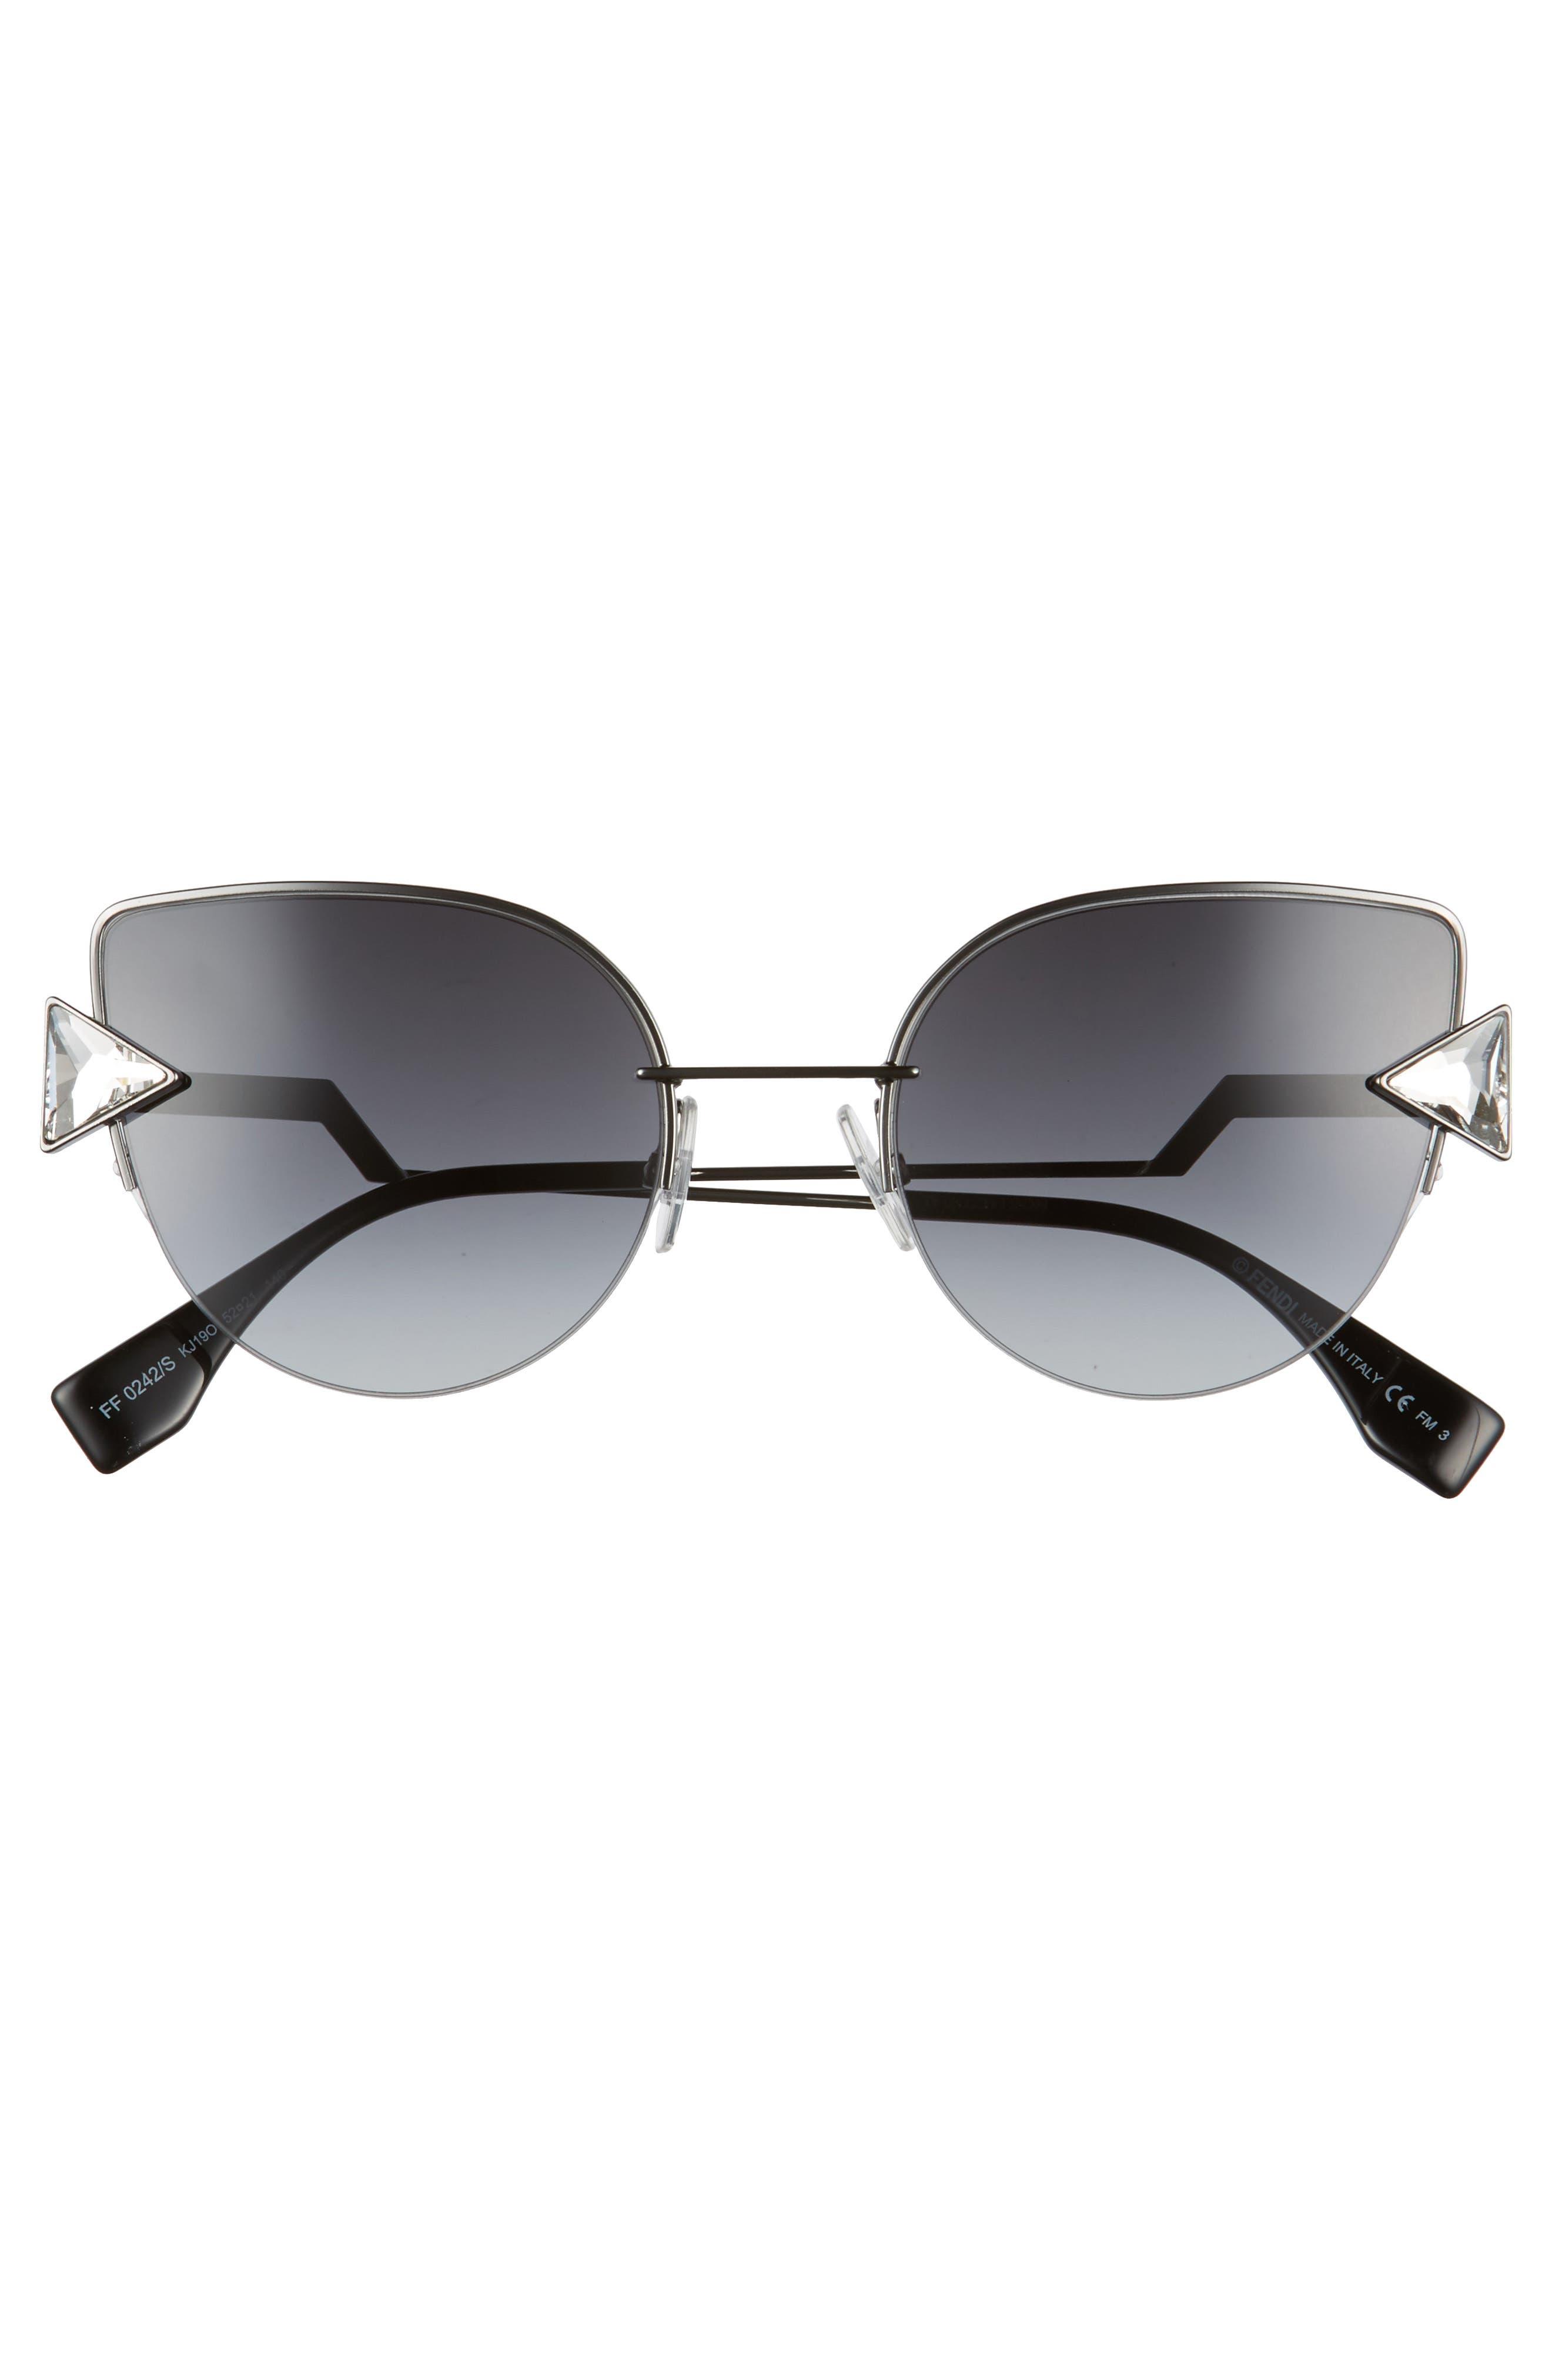 Rainbow 52mm Semi-Rimless Sunglasses,                             Alternate thumbnail 3, color,                             040